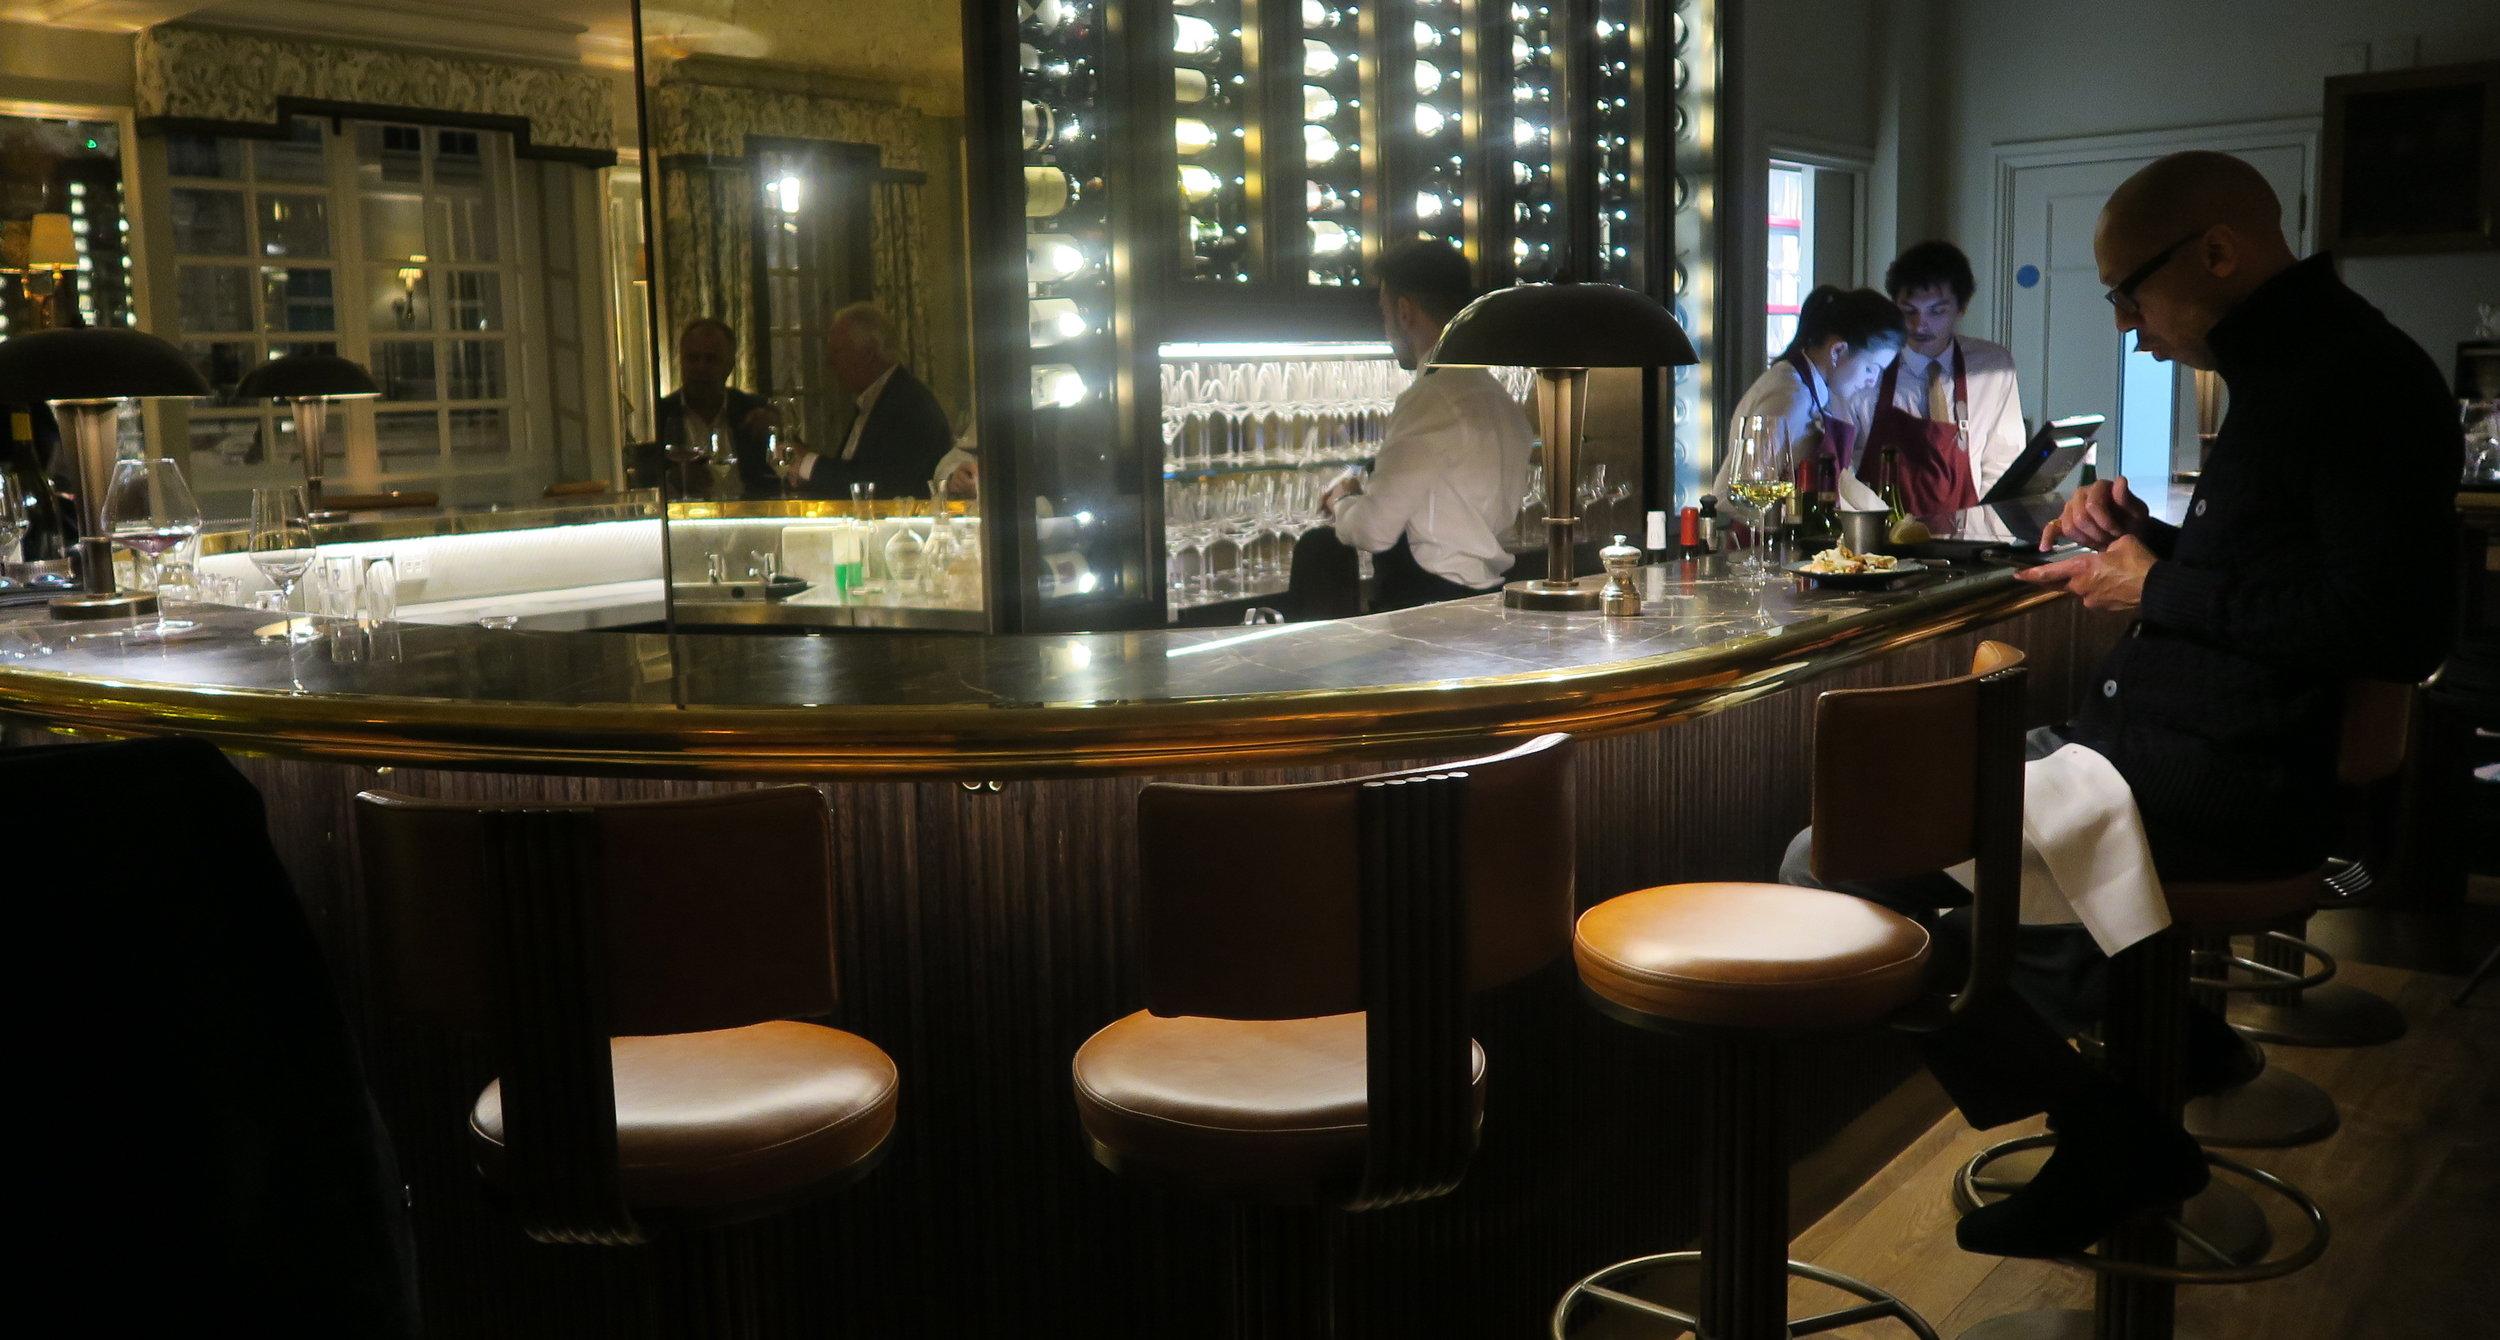 The club room bar